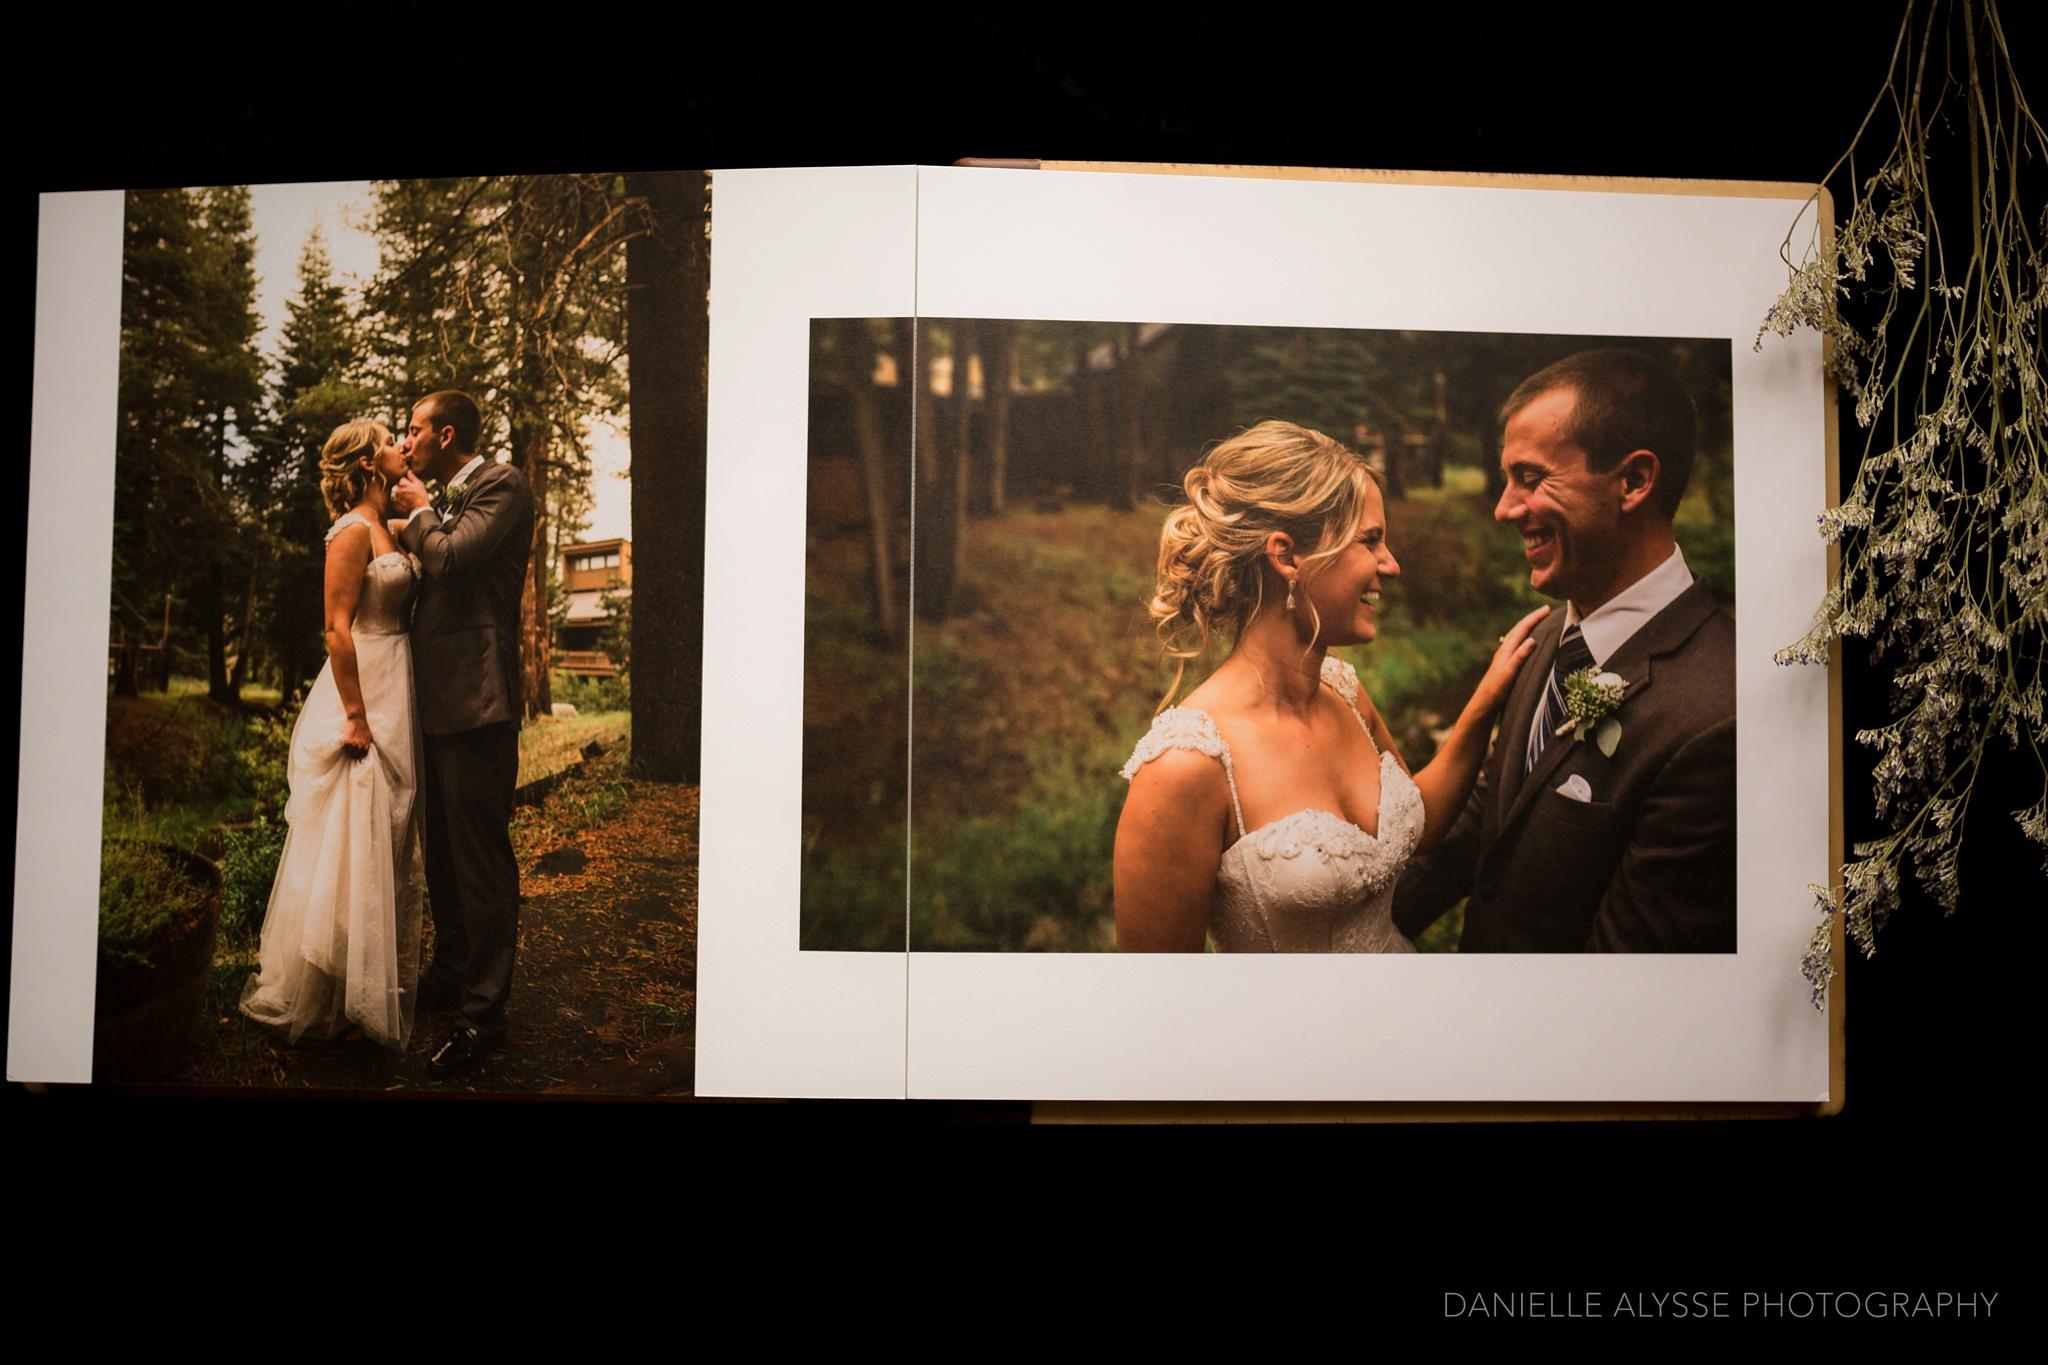 171115_wedding_album_wooden_walnut_leslie_jeremy_bear_valley_lodge_california_danielle_alysse_photography_sacramento_photographer_33_WEB.jpg